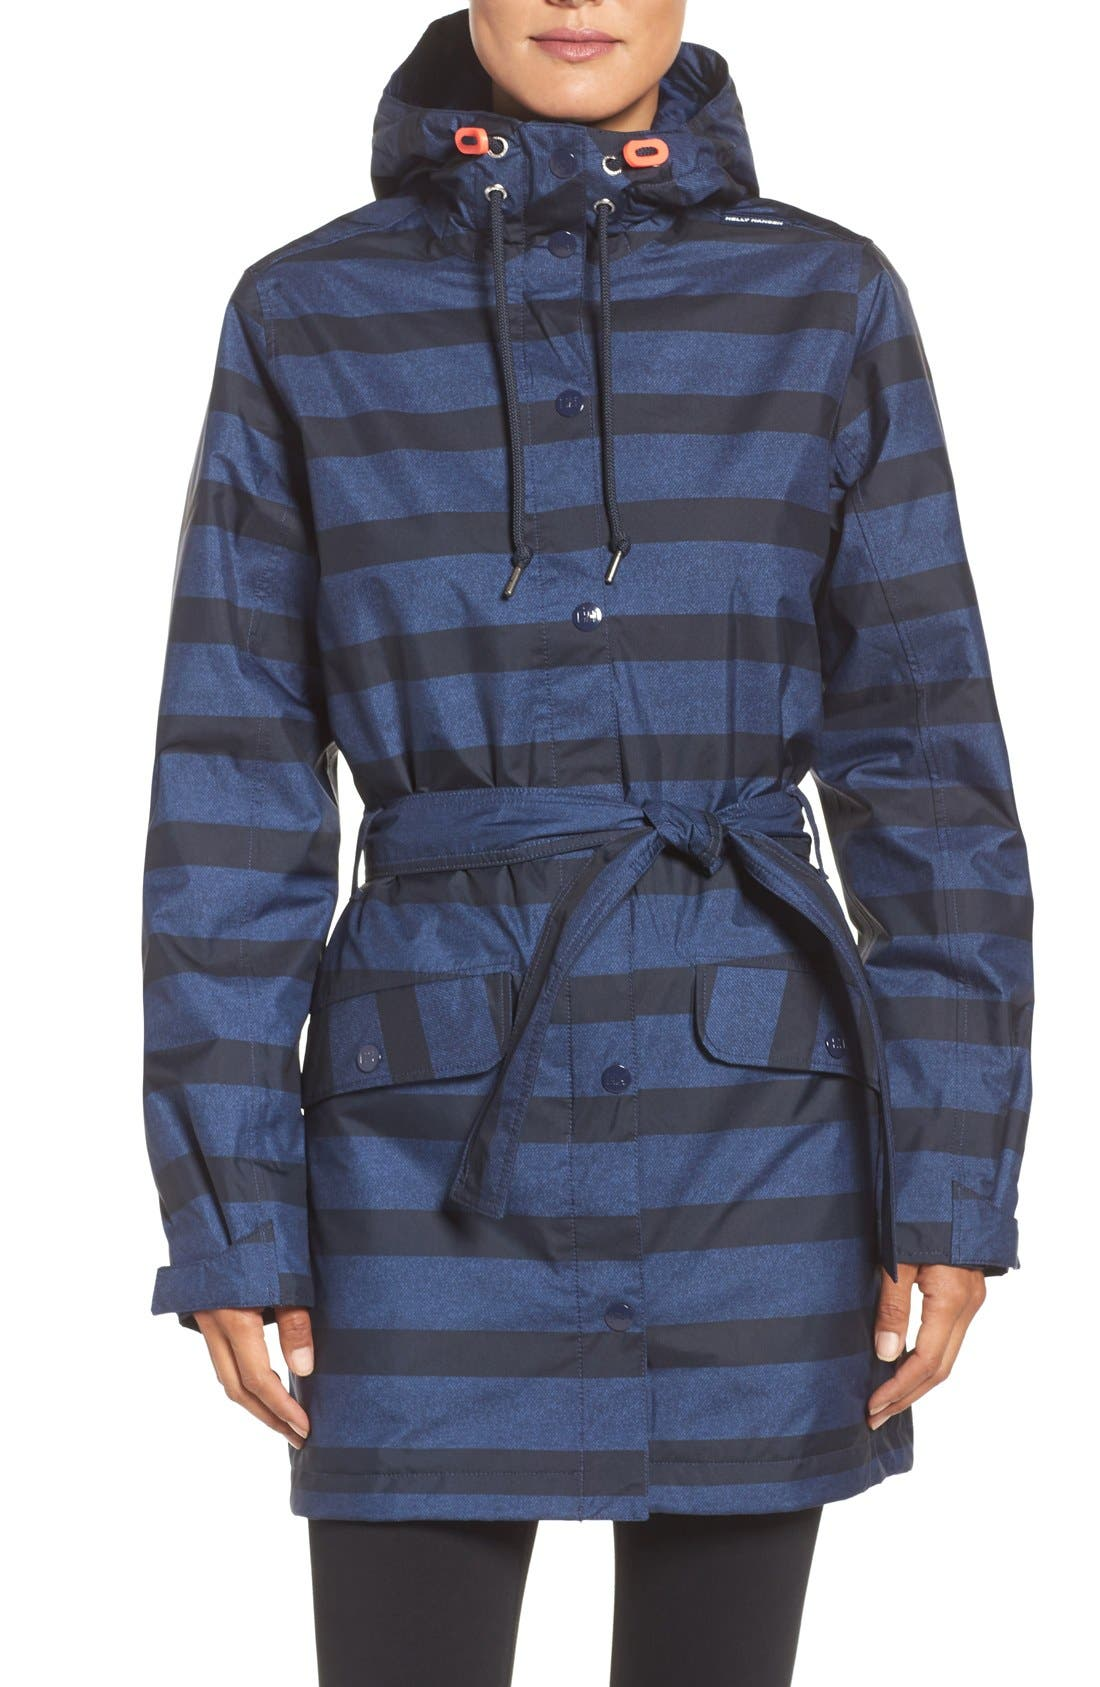 Alternate Image 1 Selected - HellyHansen 'Lyness' Insulated Waterproof Coat